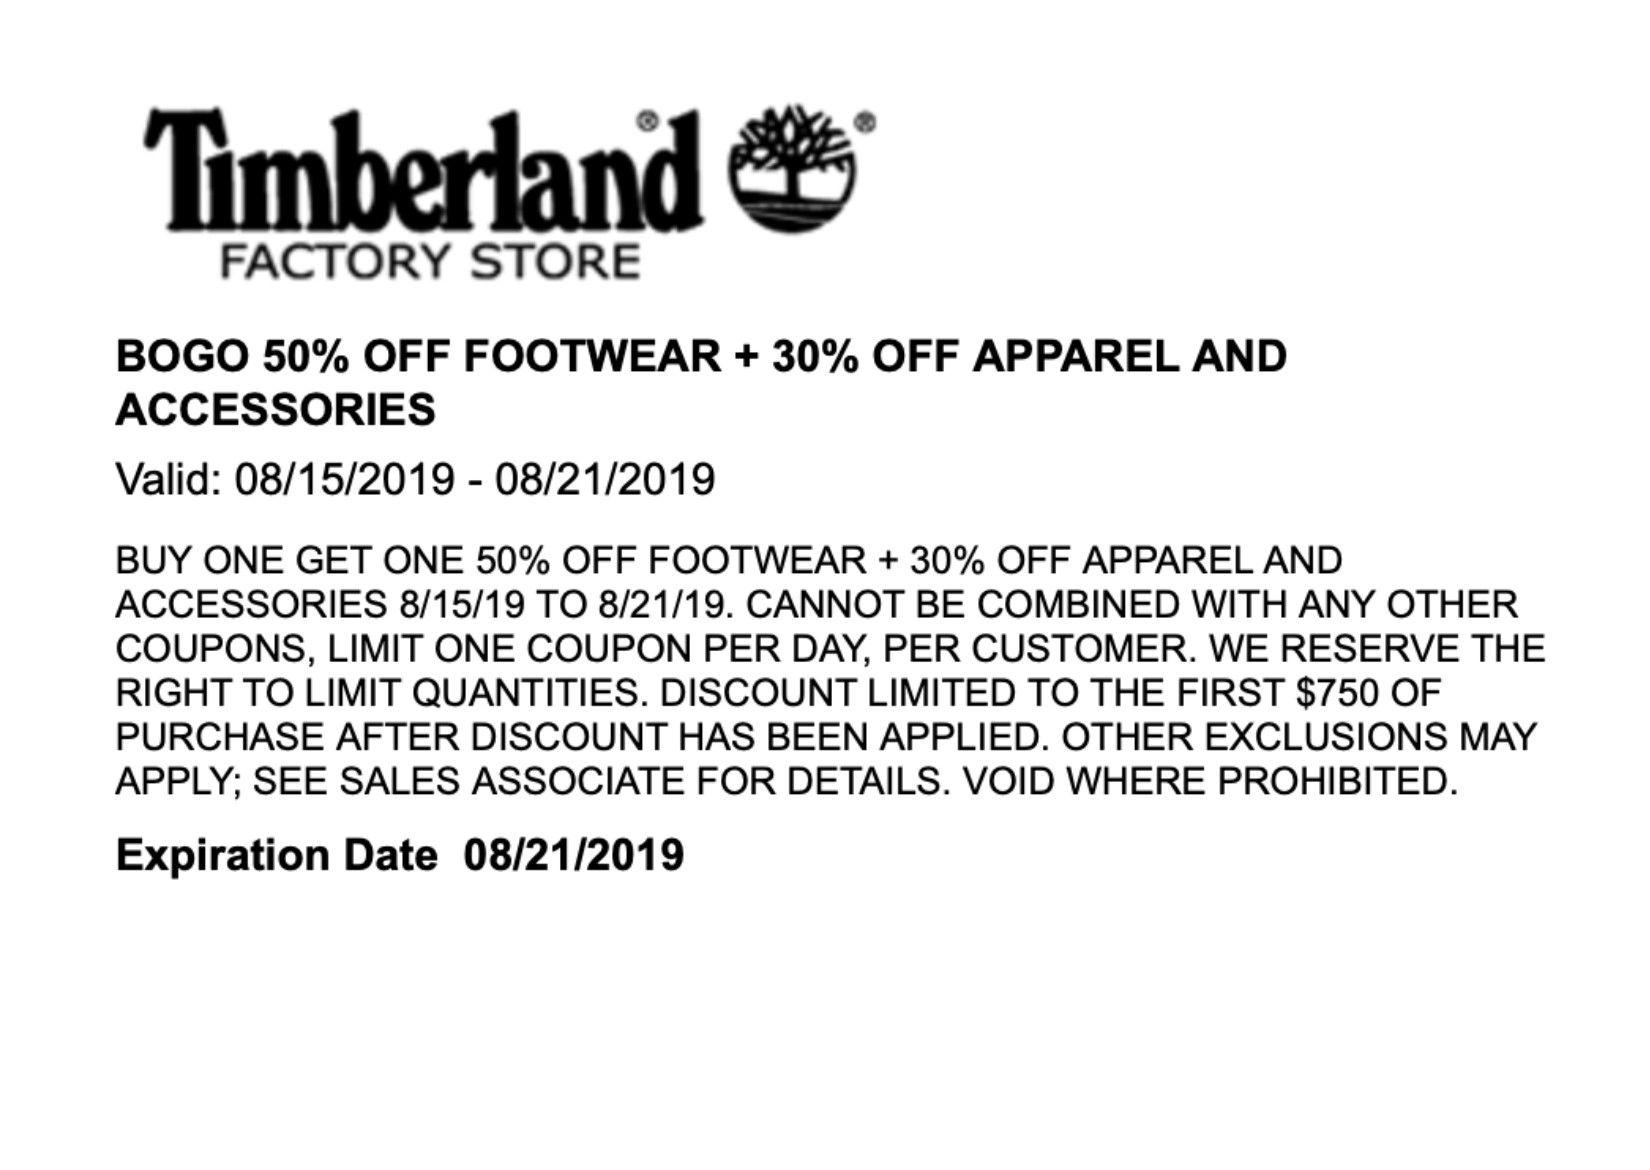 Timberland BOGO 50% FOOTWEAR + 30% OFF Lake Buena Vista